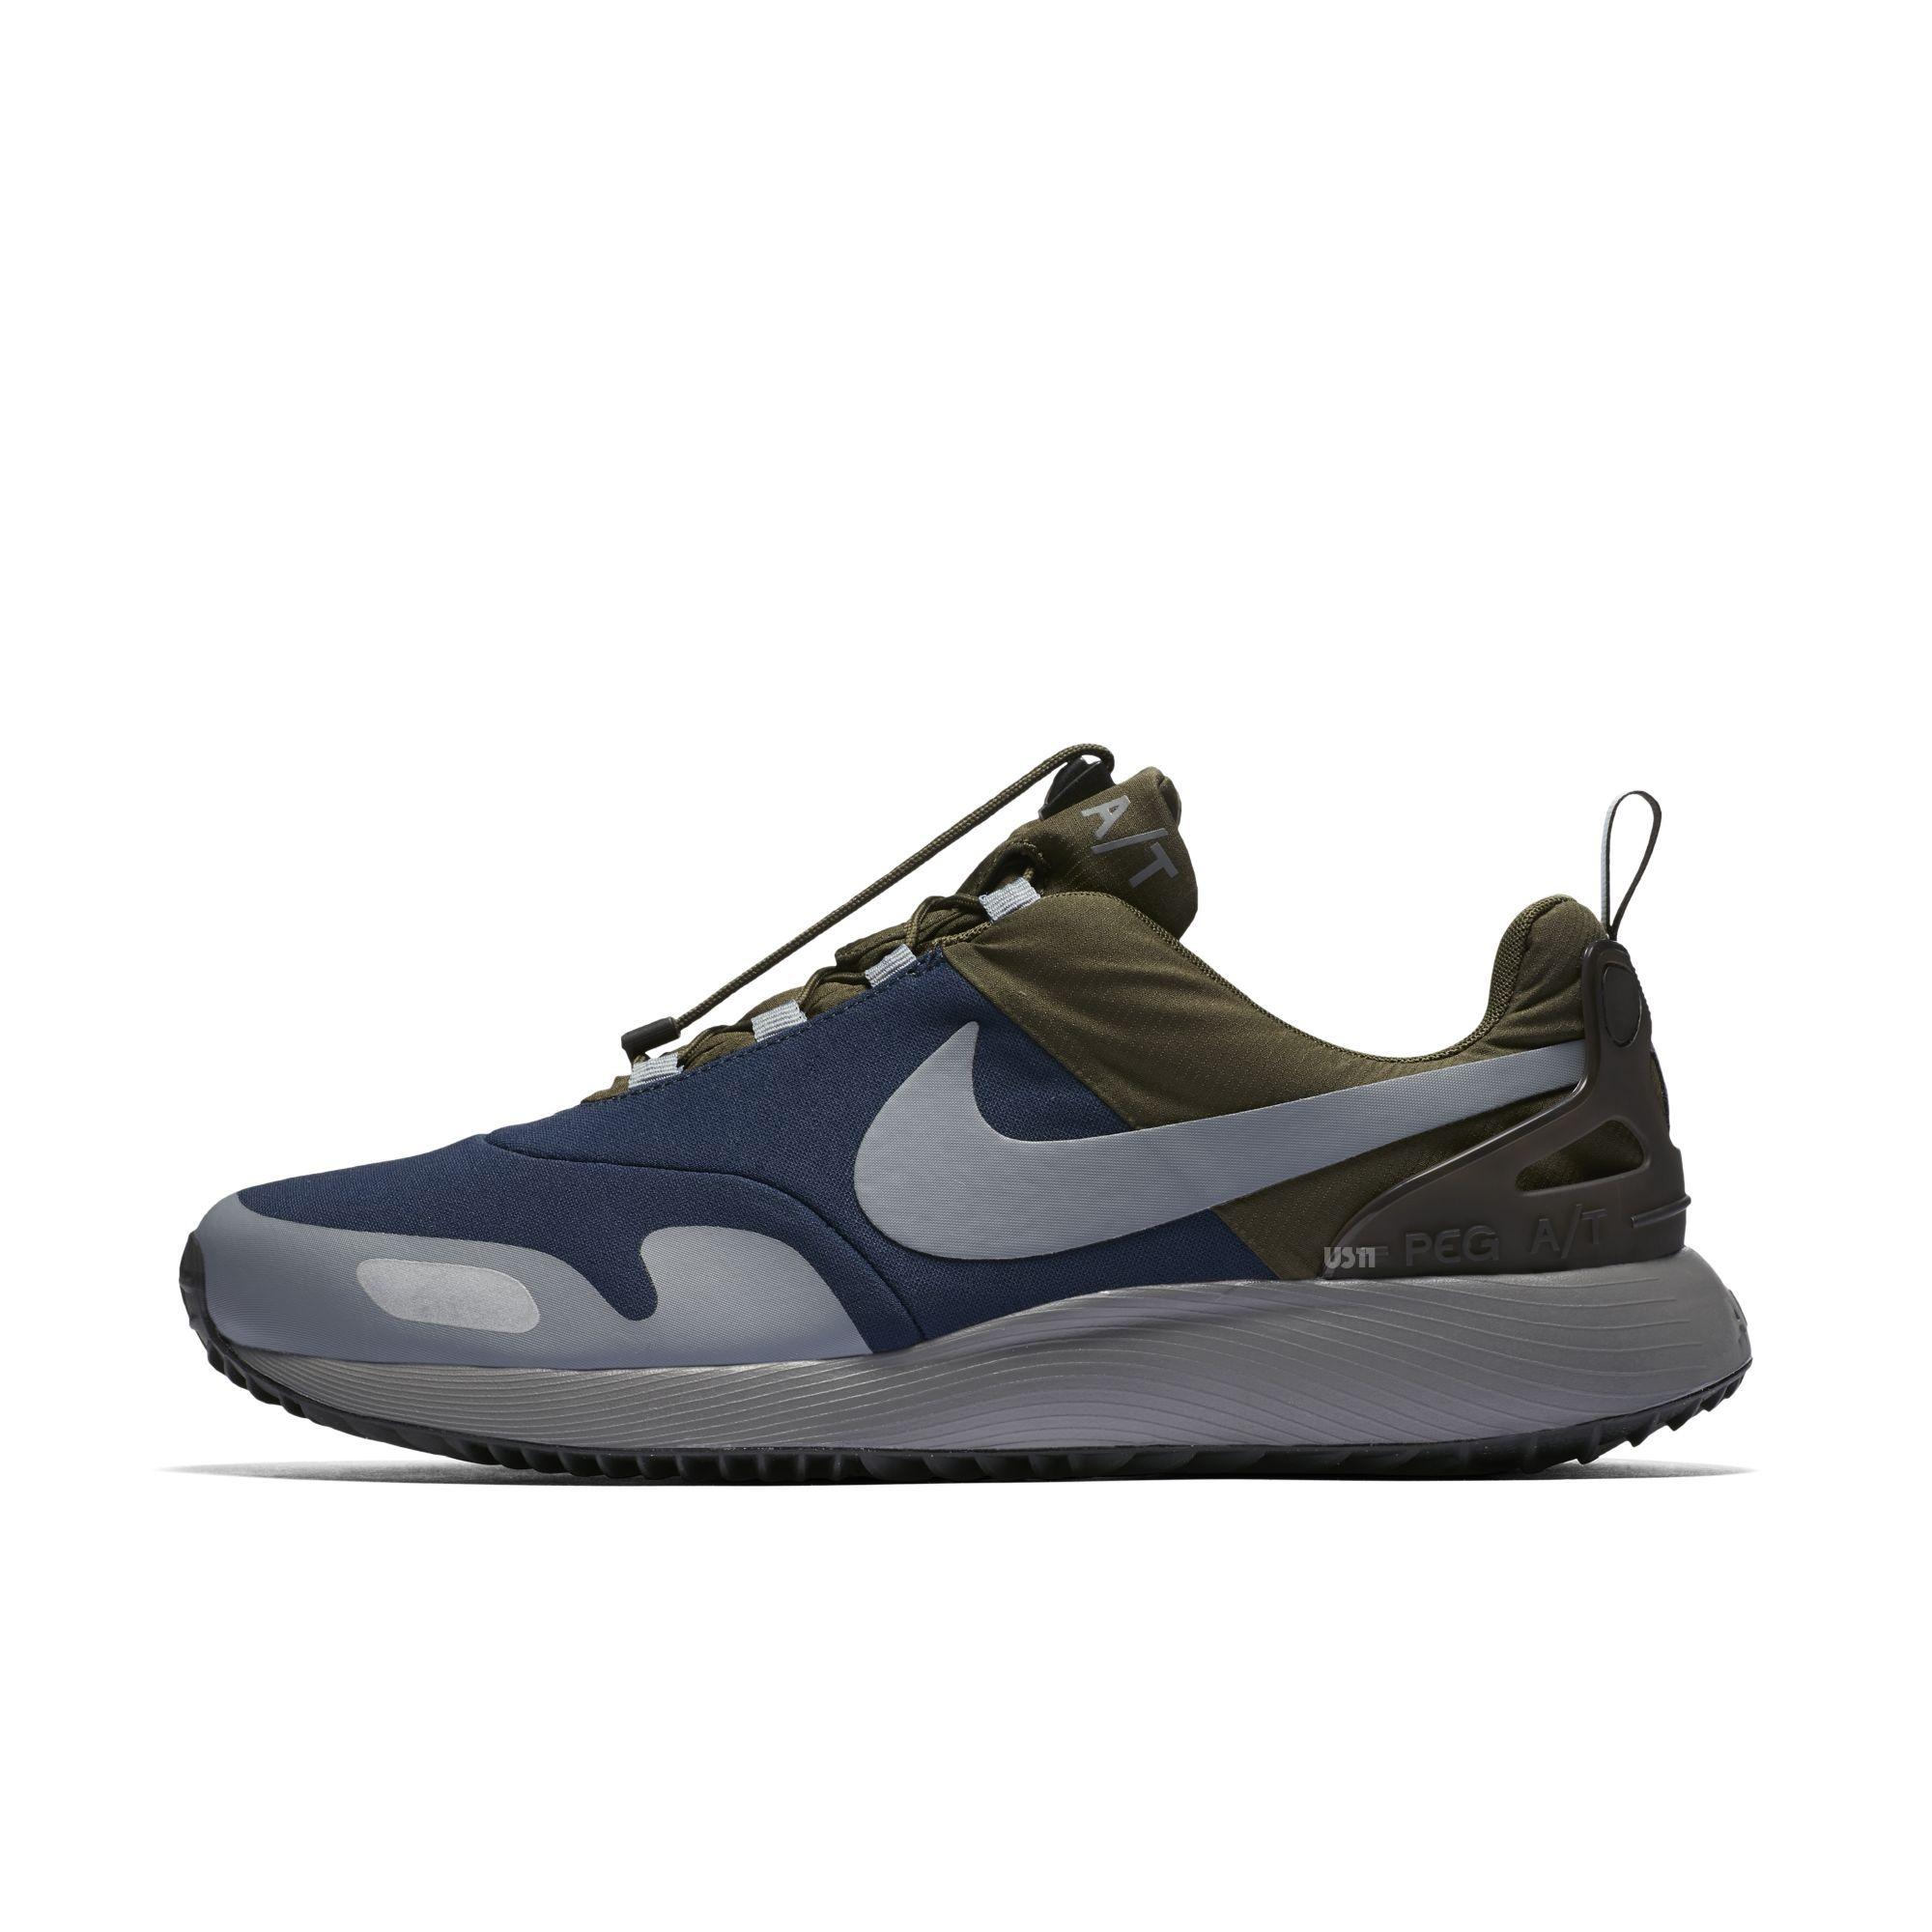 9f2c0c835a9bc Nike Air Pegasus AT Pinnacle Men s Shoe Size 11.5 (Red)